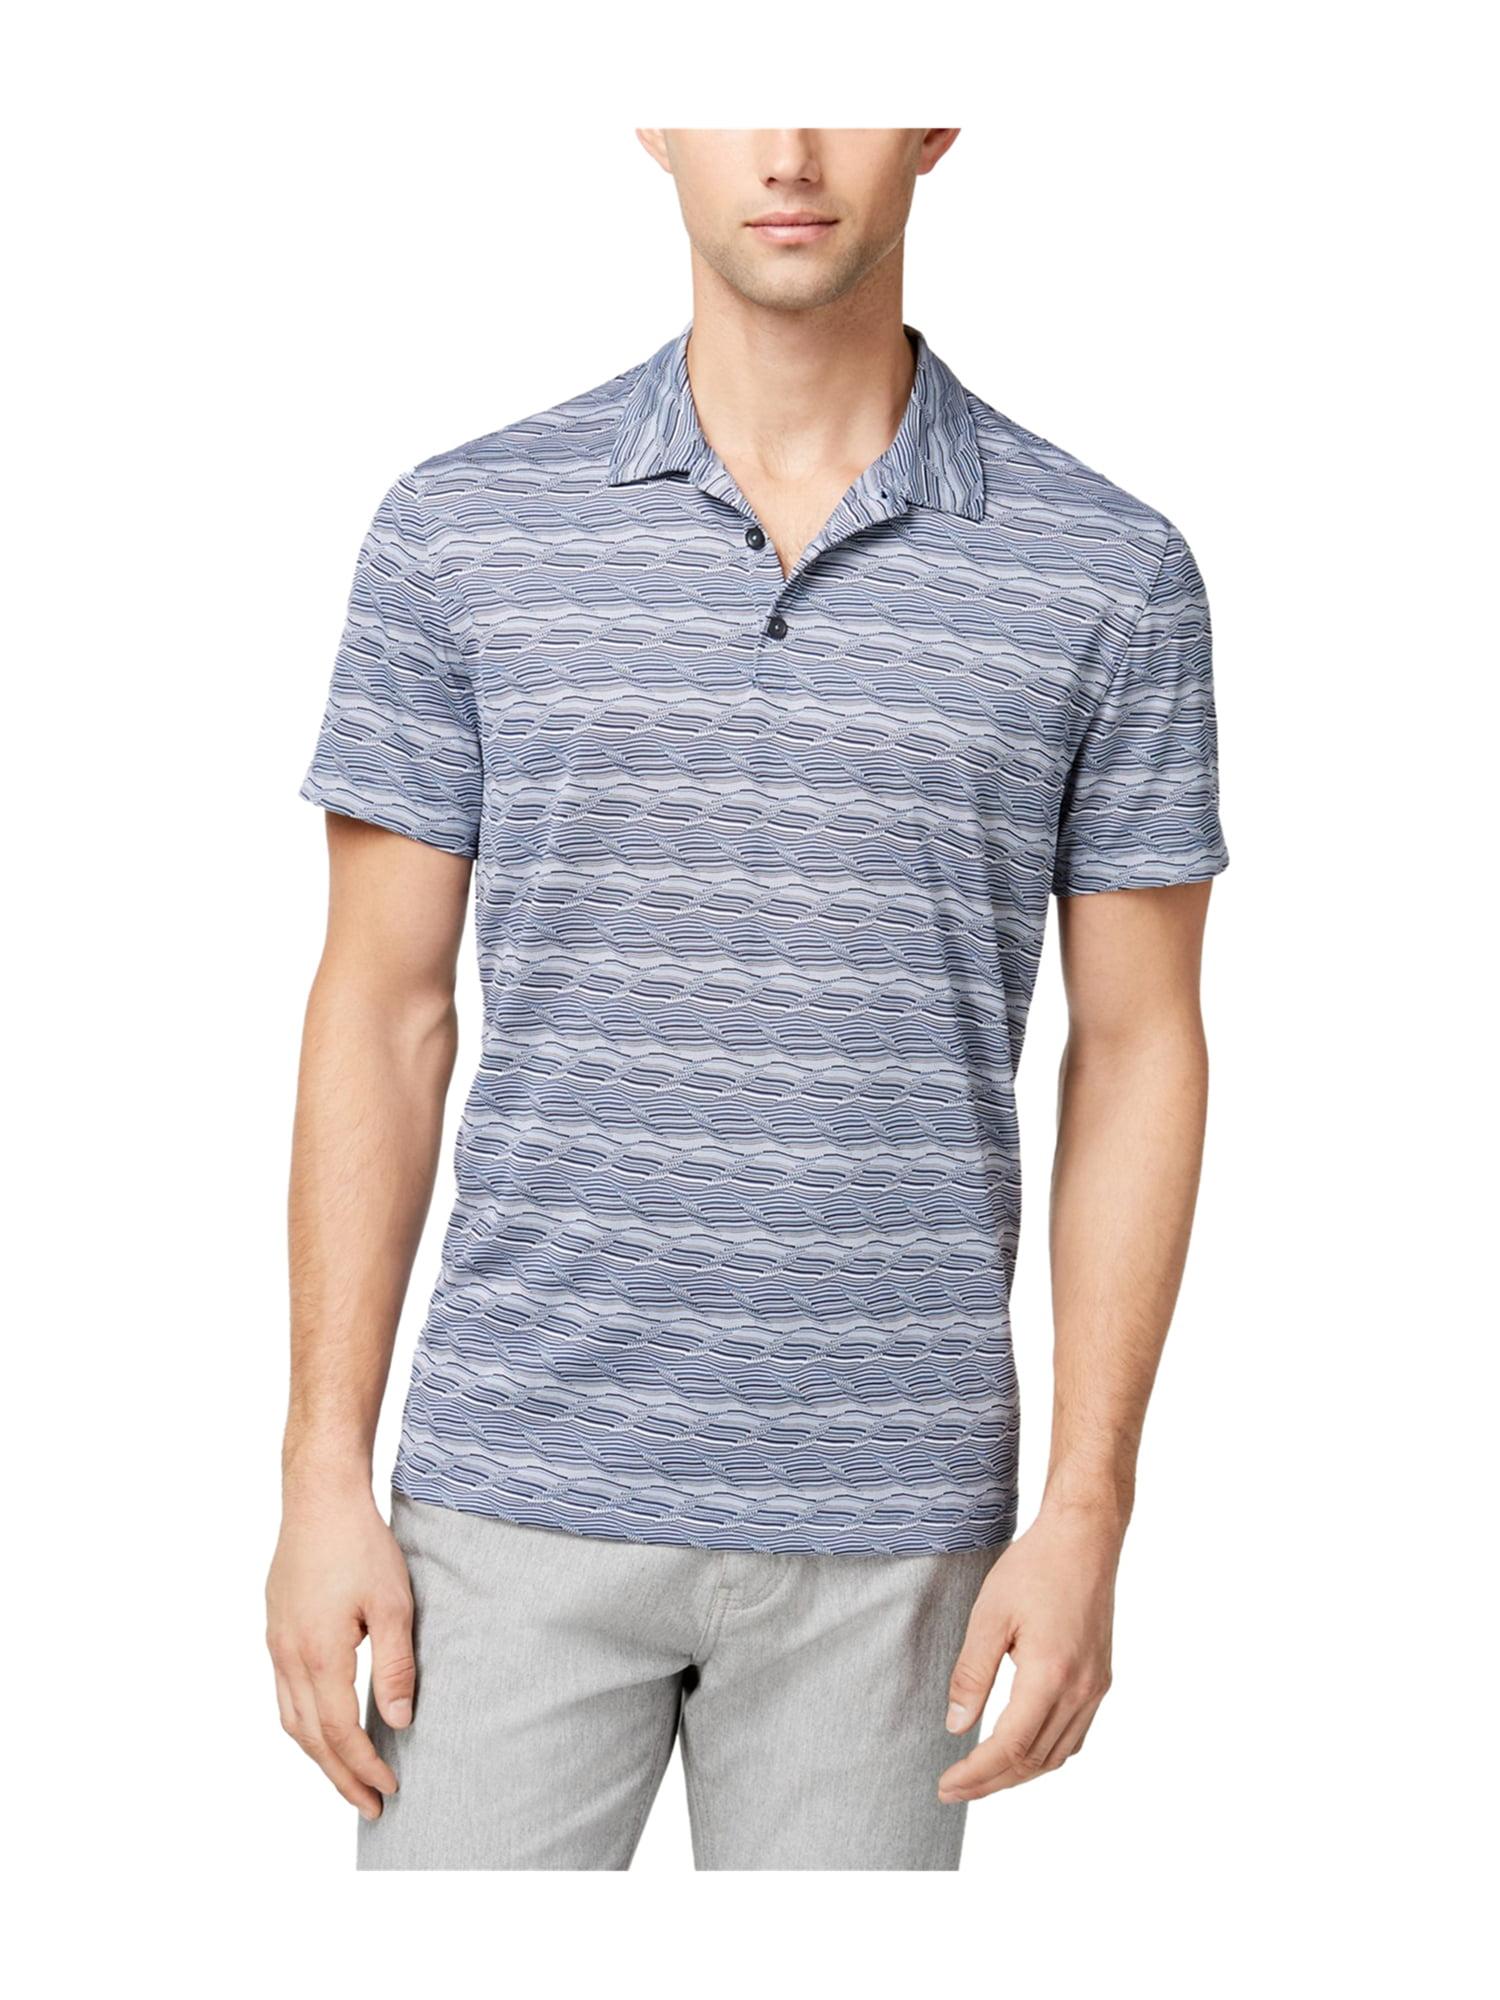 c2fa99688 Men s Polo Shirts   Men s Golf Shirts